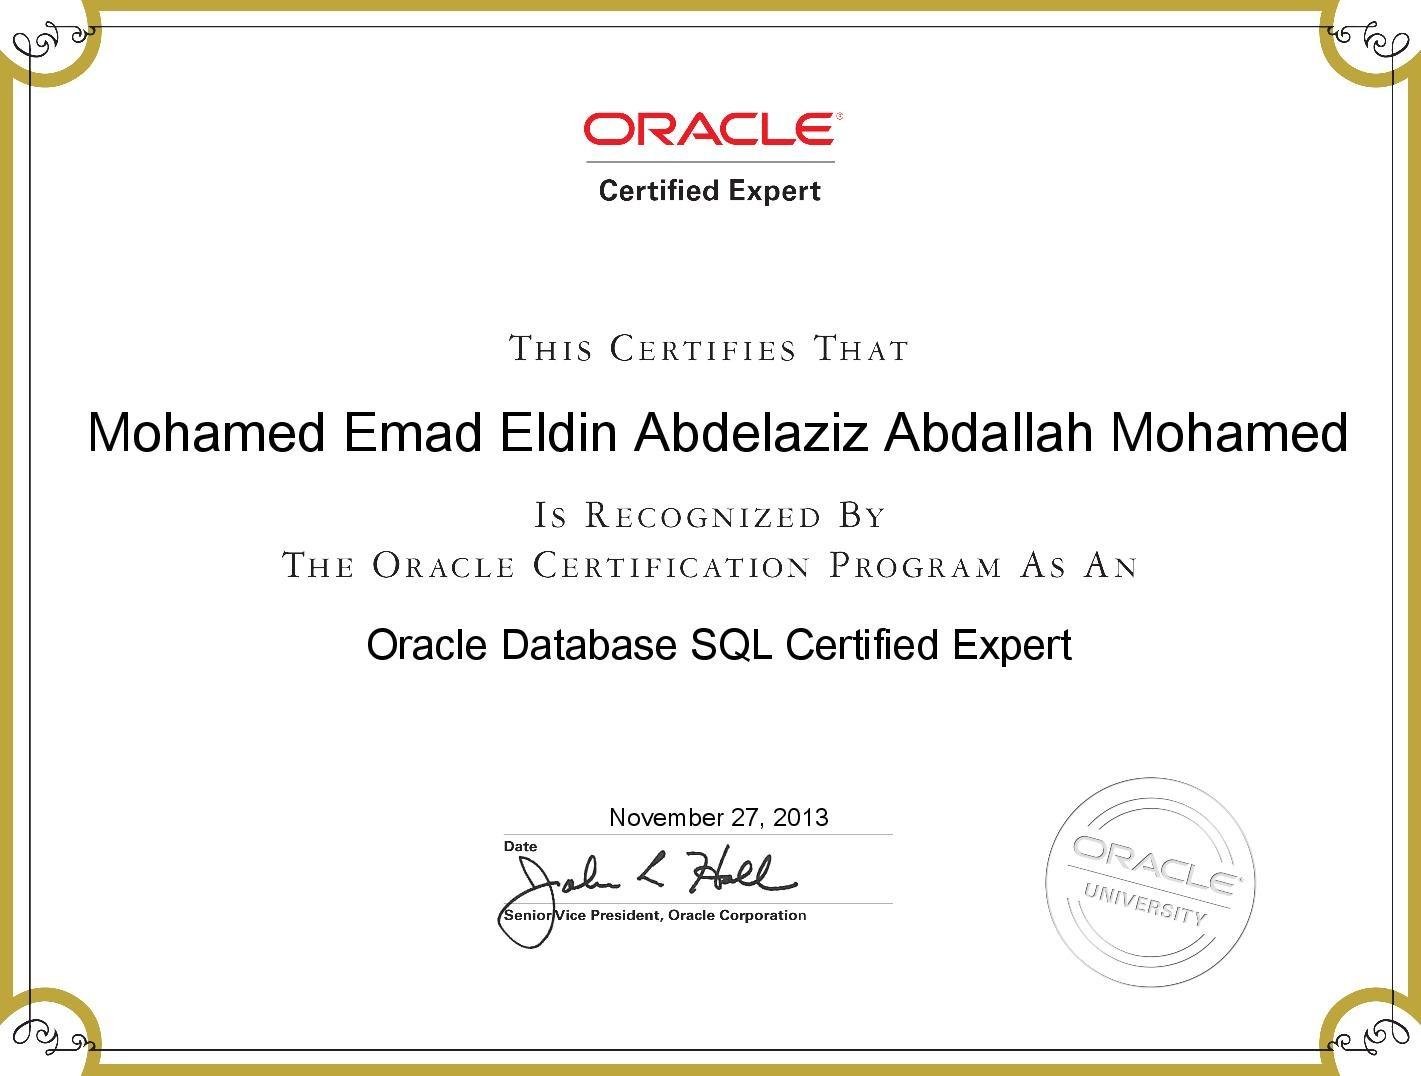 Mohamed emad eldin abdelaziz abdallah mohamed bayt oracle database sql certified expert certificate 1betcityfo Image collections